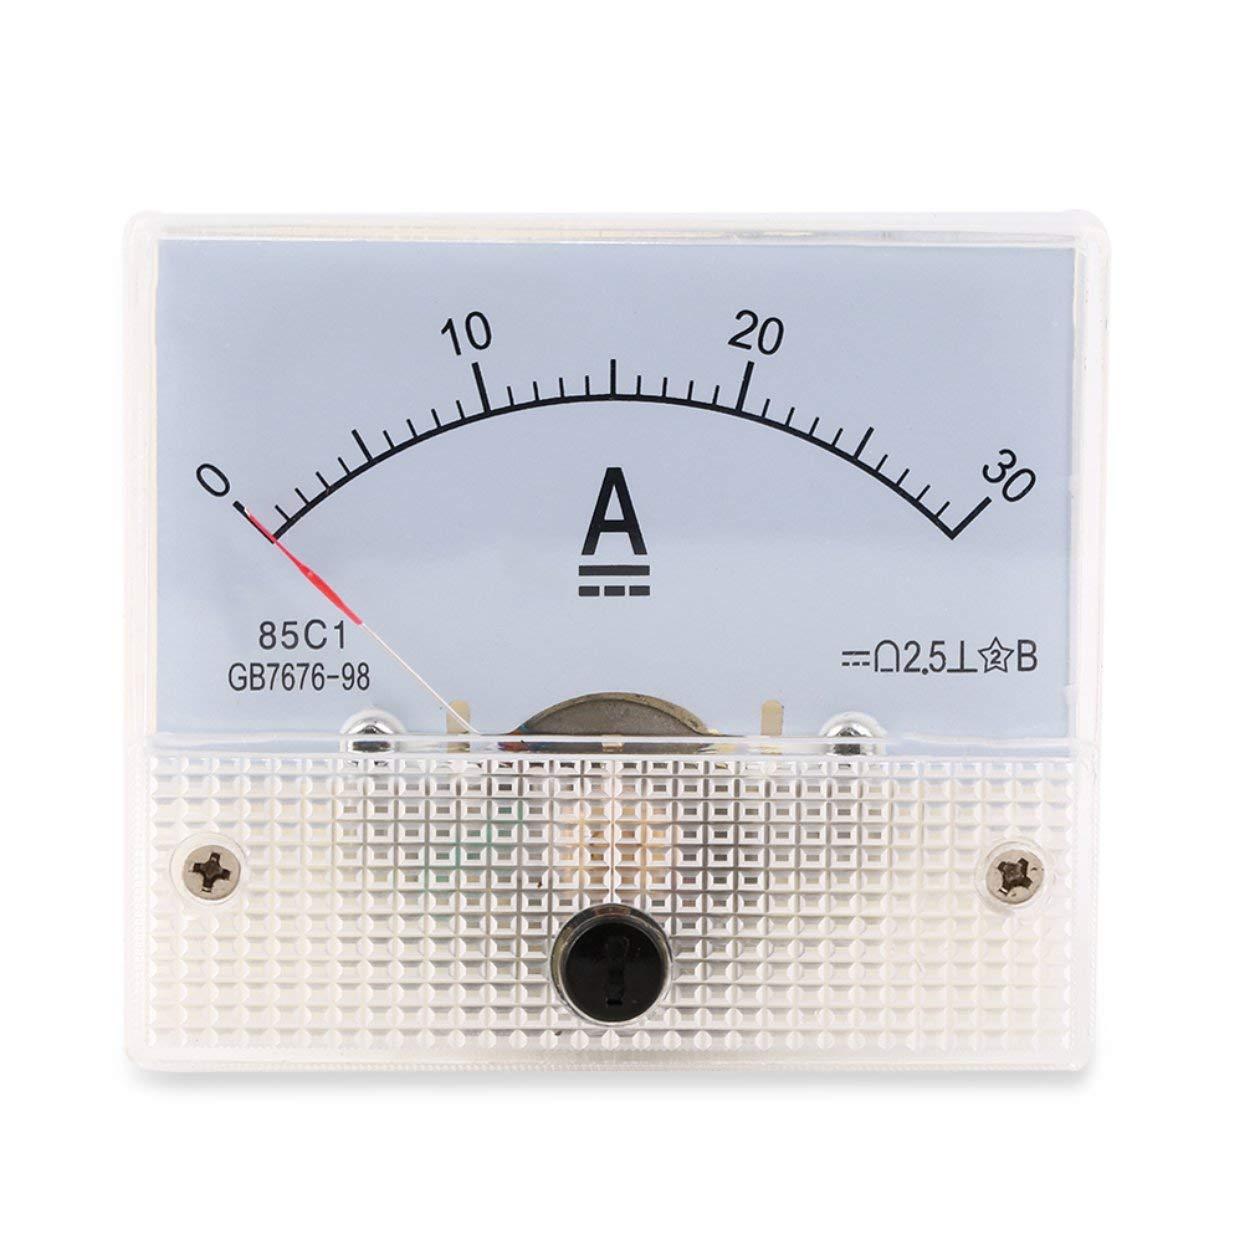 Dailyinshop DC 30A analogico Amperometro Panel Meter analogico Corrente 0-30A Pannello amperometro